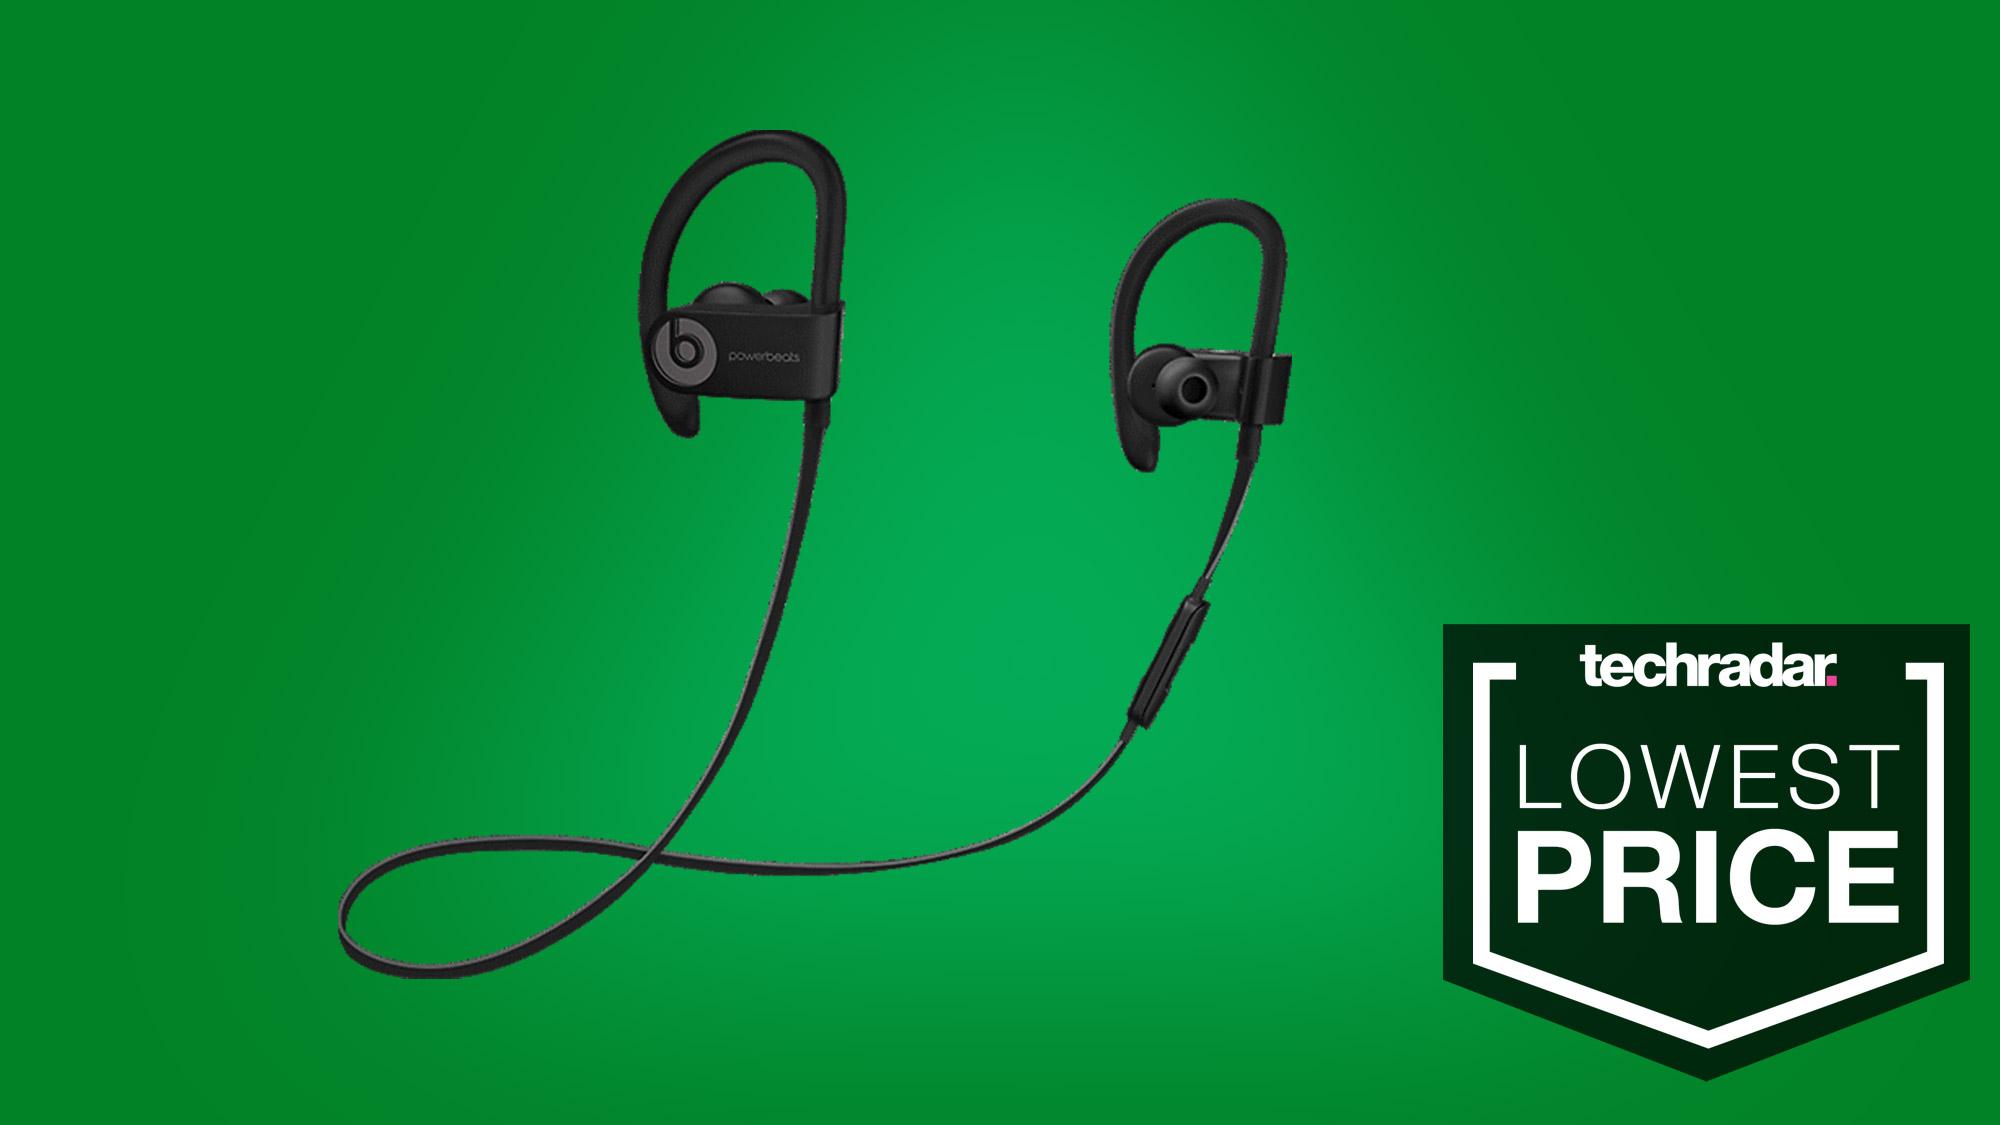 Beats Headphone Sale The Powerbeats 3 Hit Lowest Price Ever At Amazon Techradar